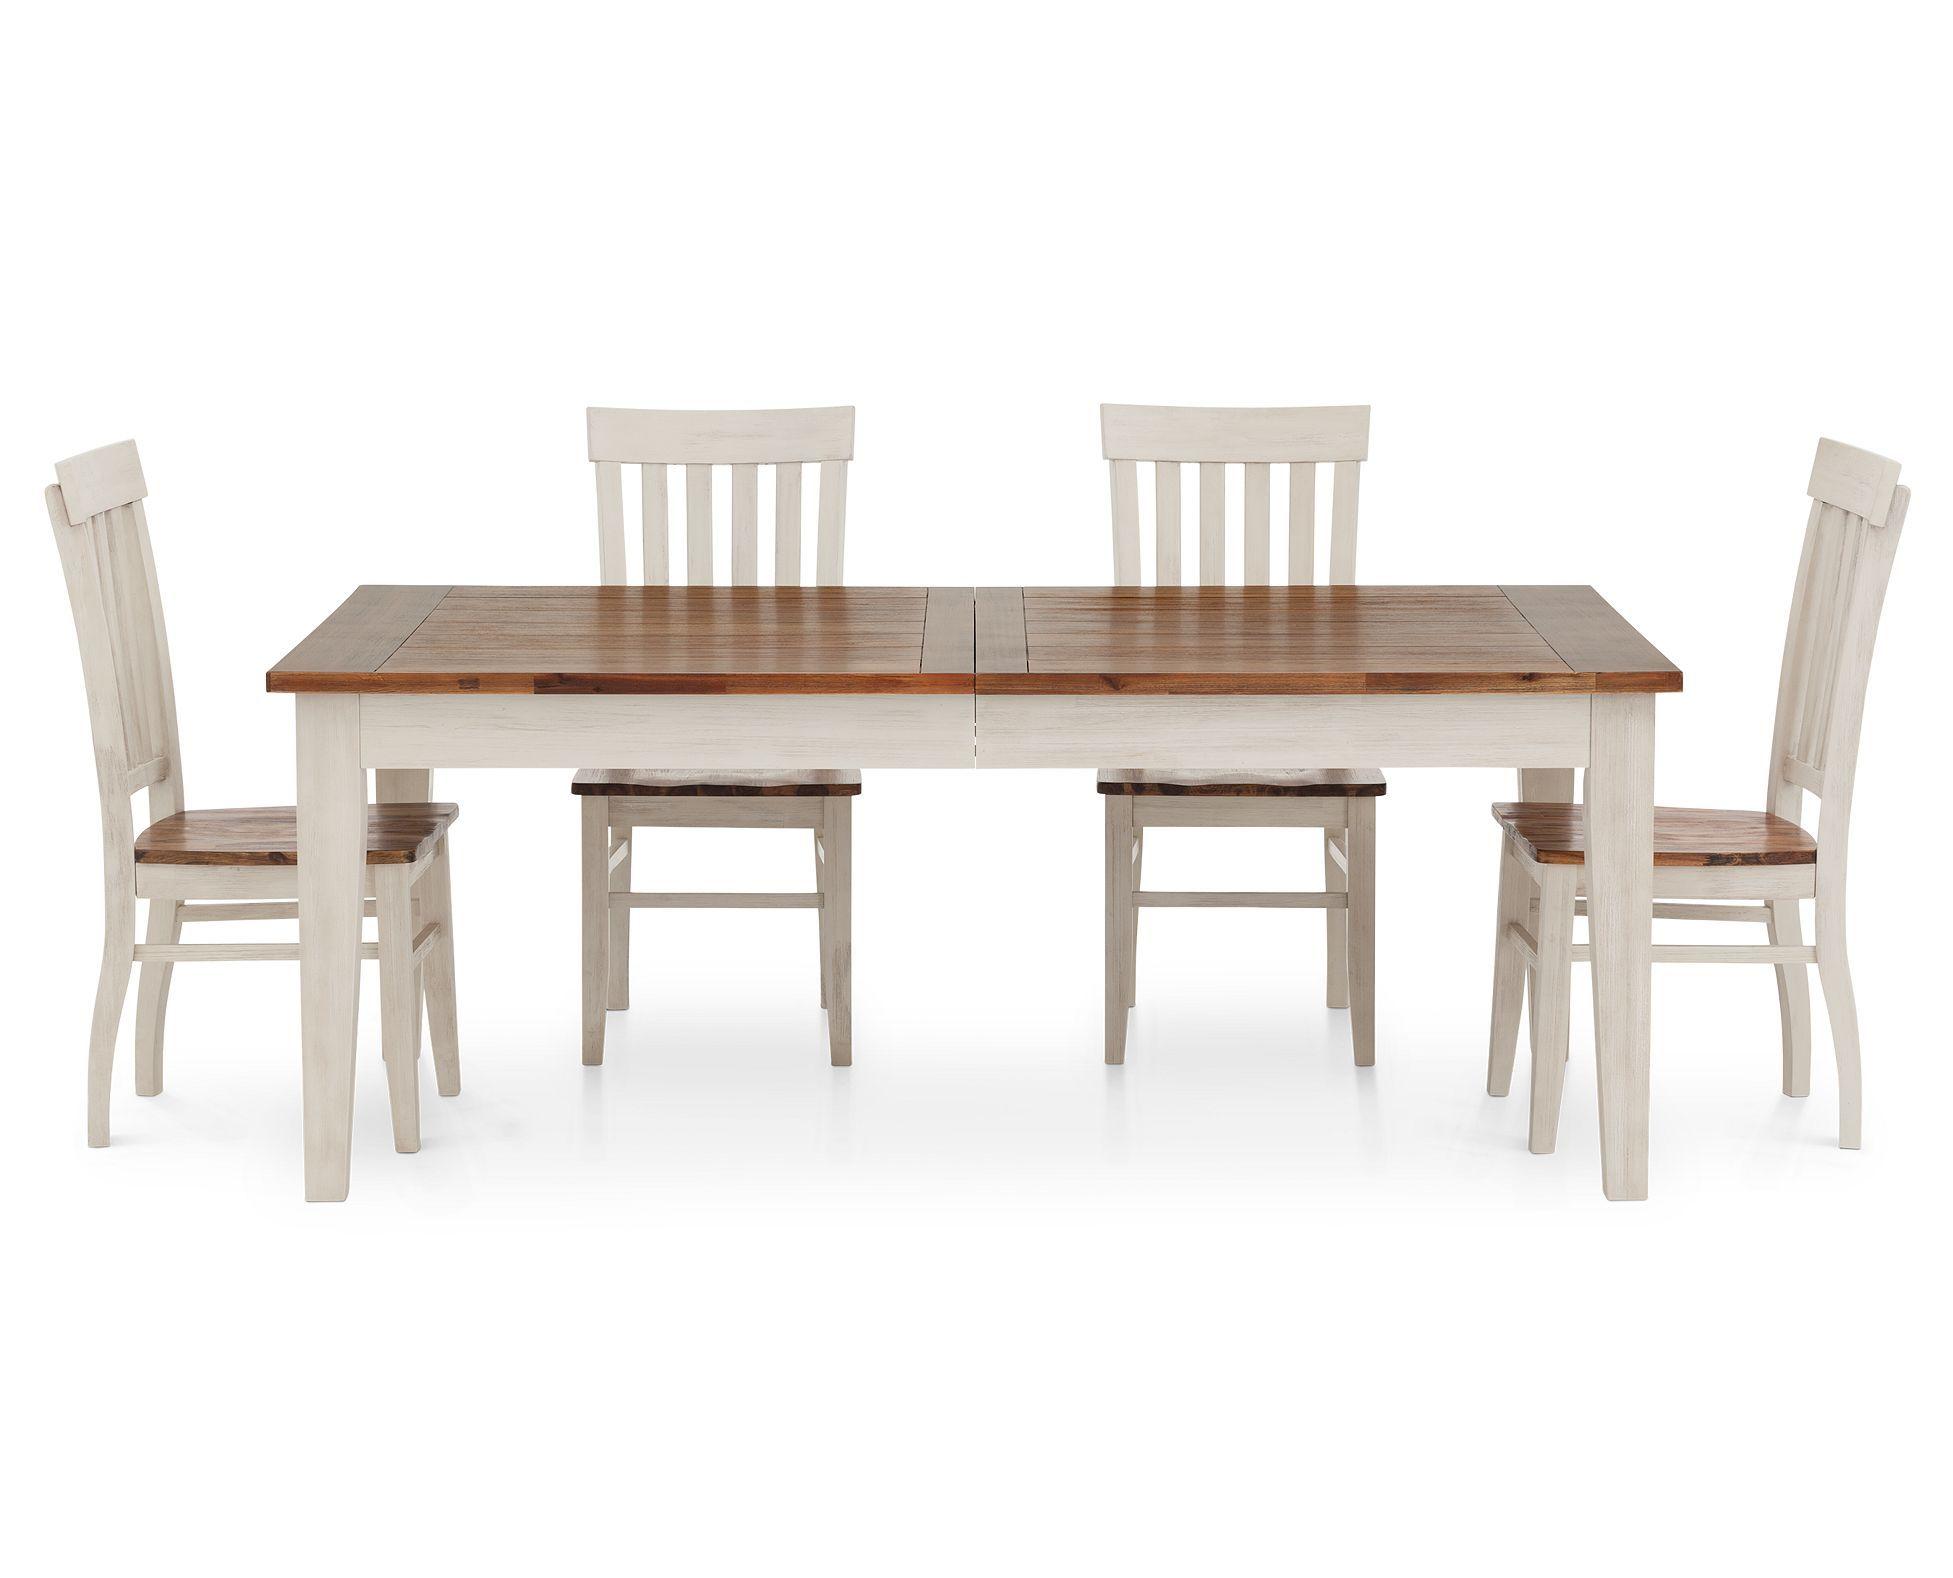 Black friday save 100 on the sullivan 5 piece dining set now 799 blackfriday furniturerow